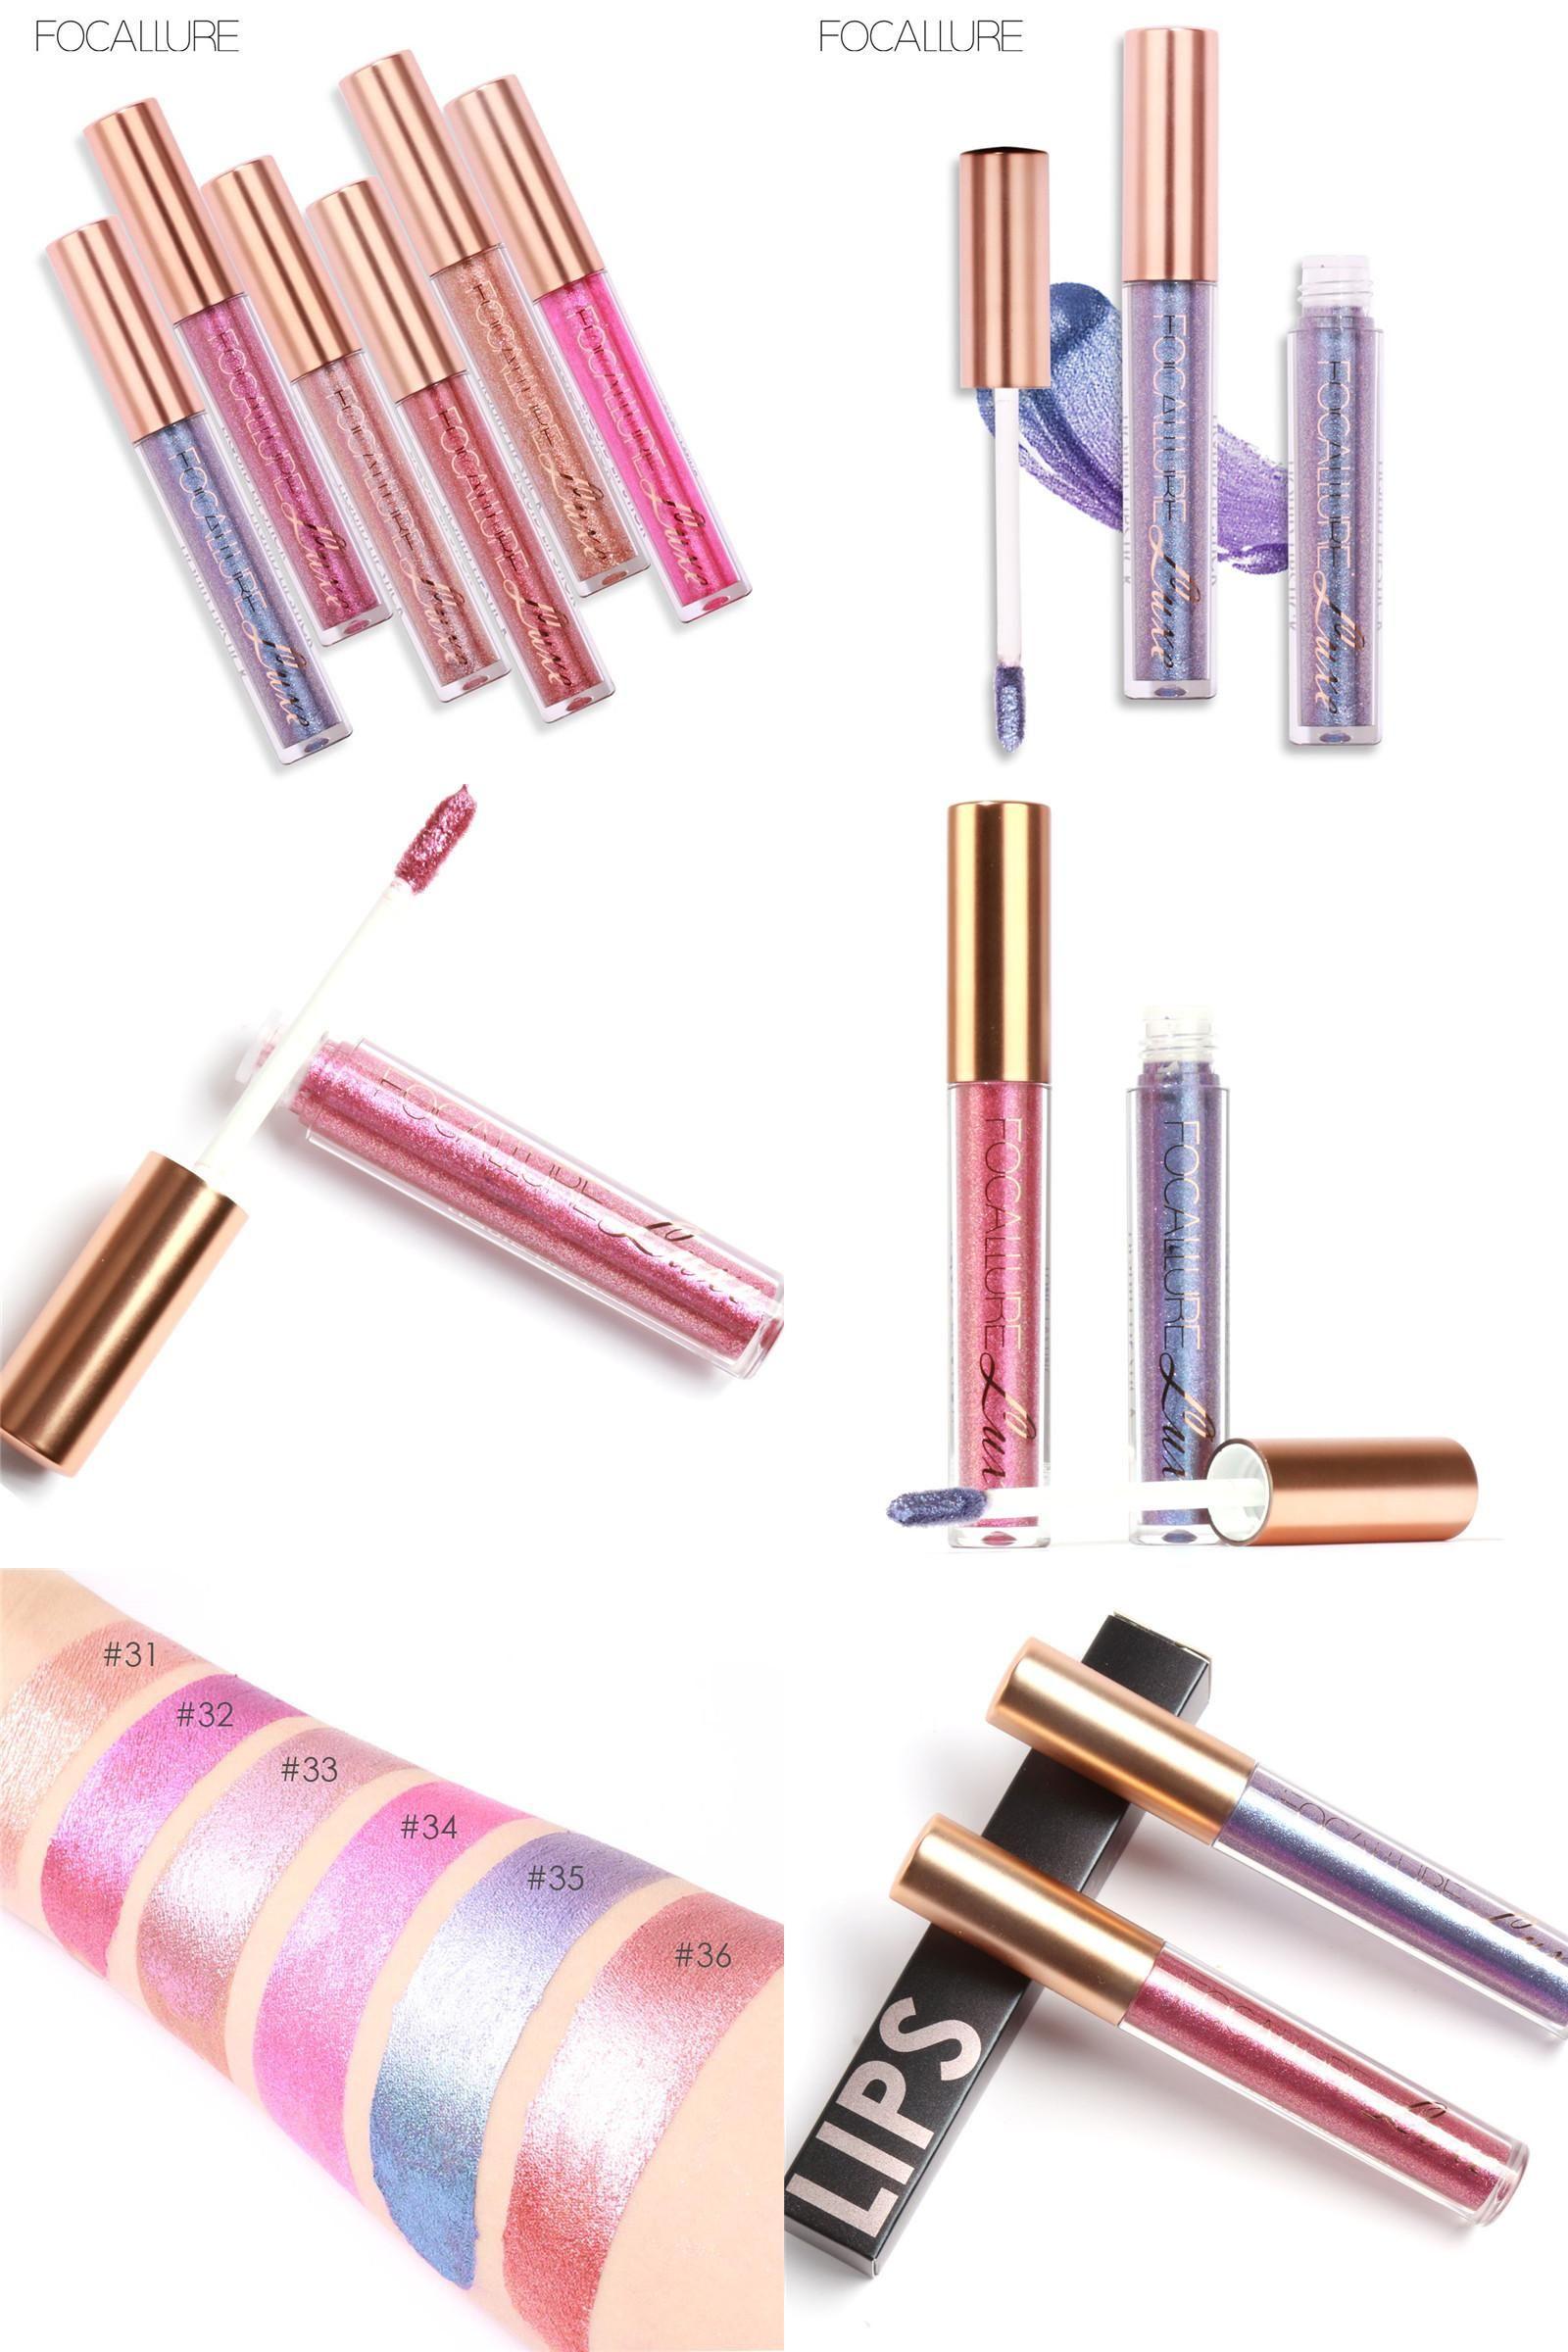 Maquiagem Professional 4 Colors Fashion Glitter Eyeshadow